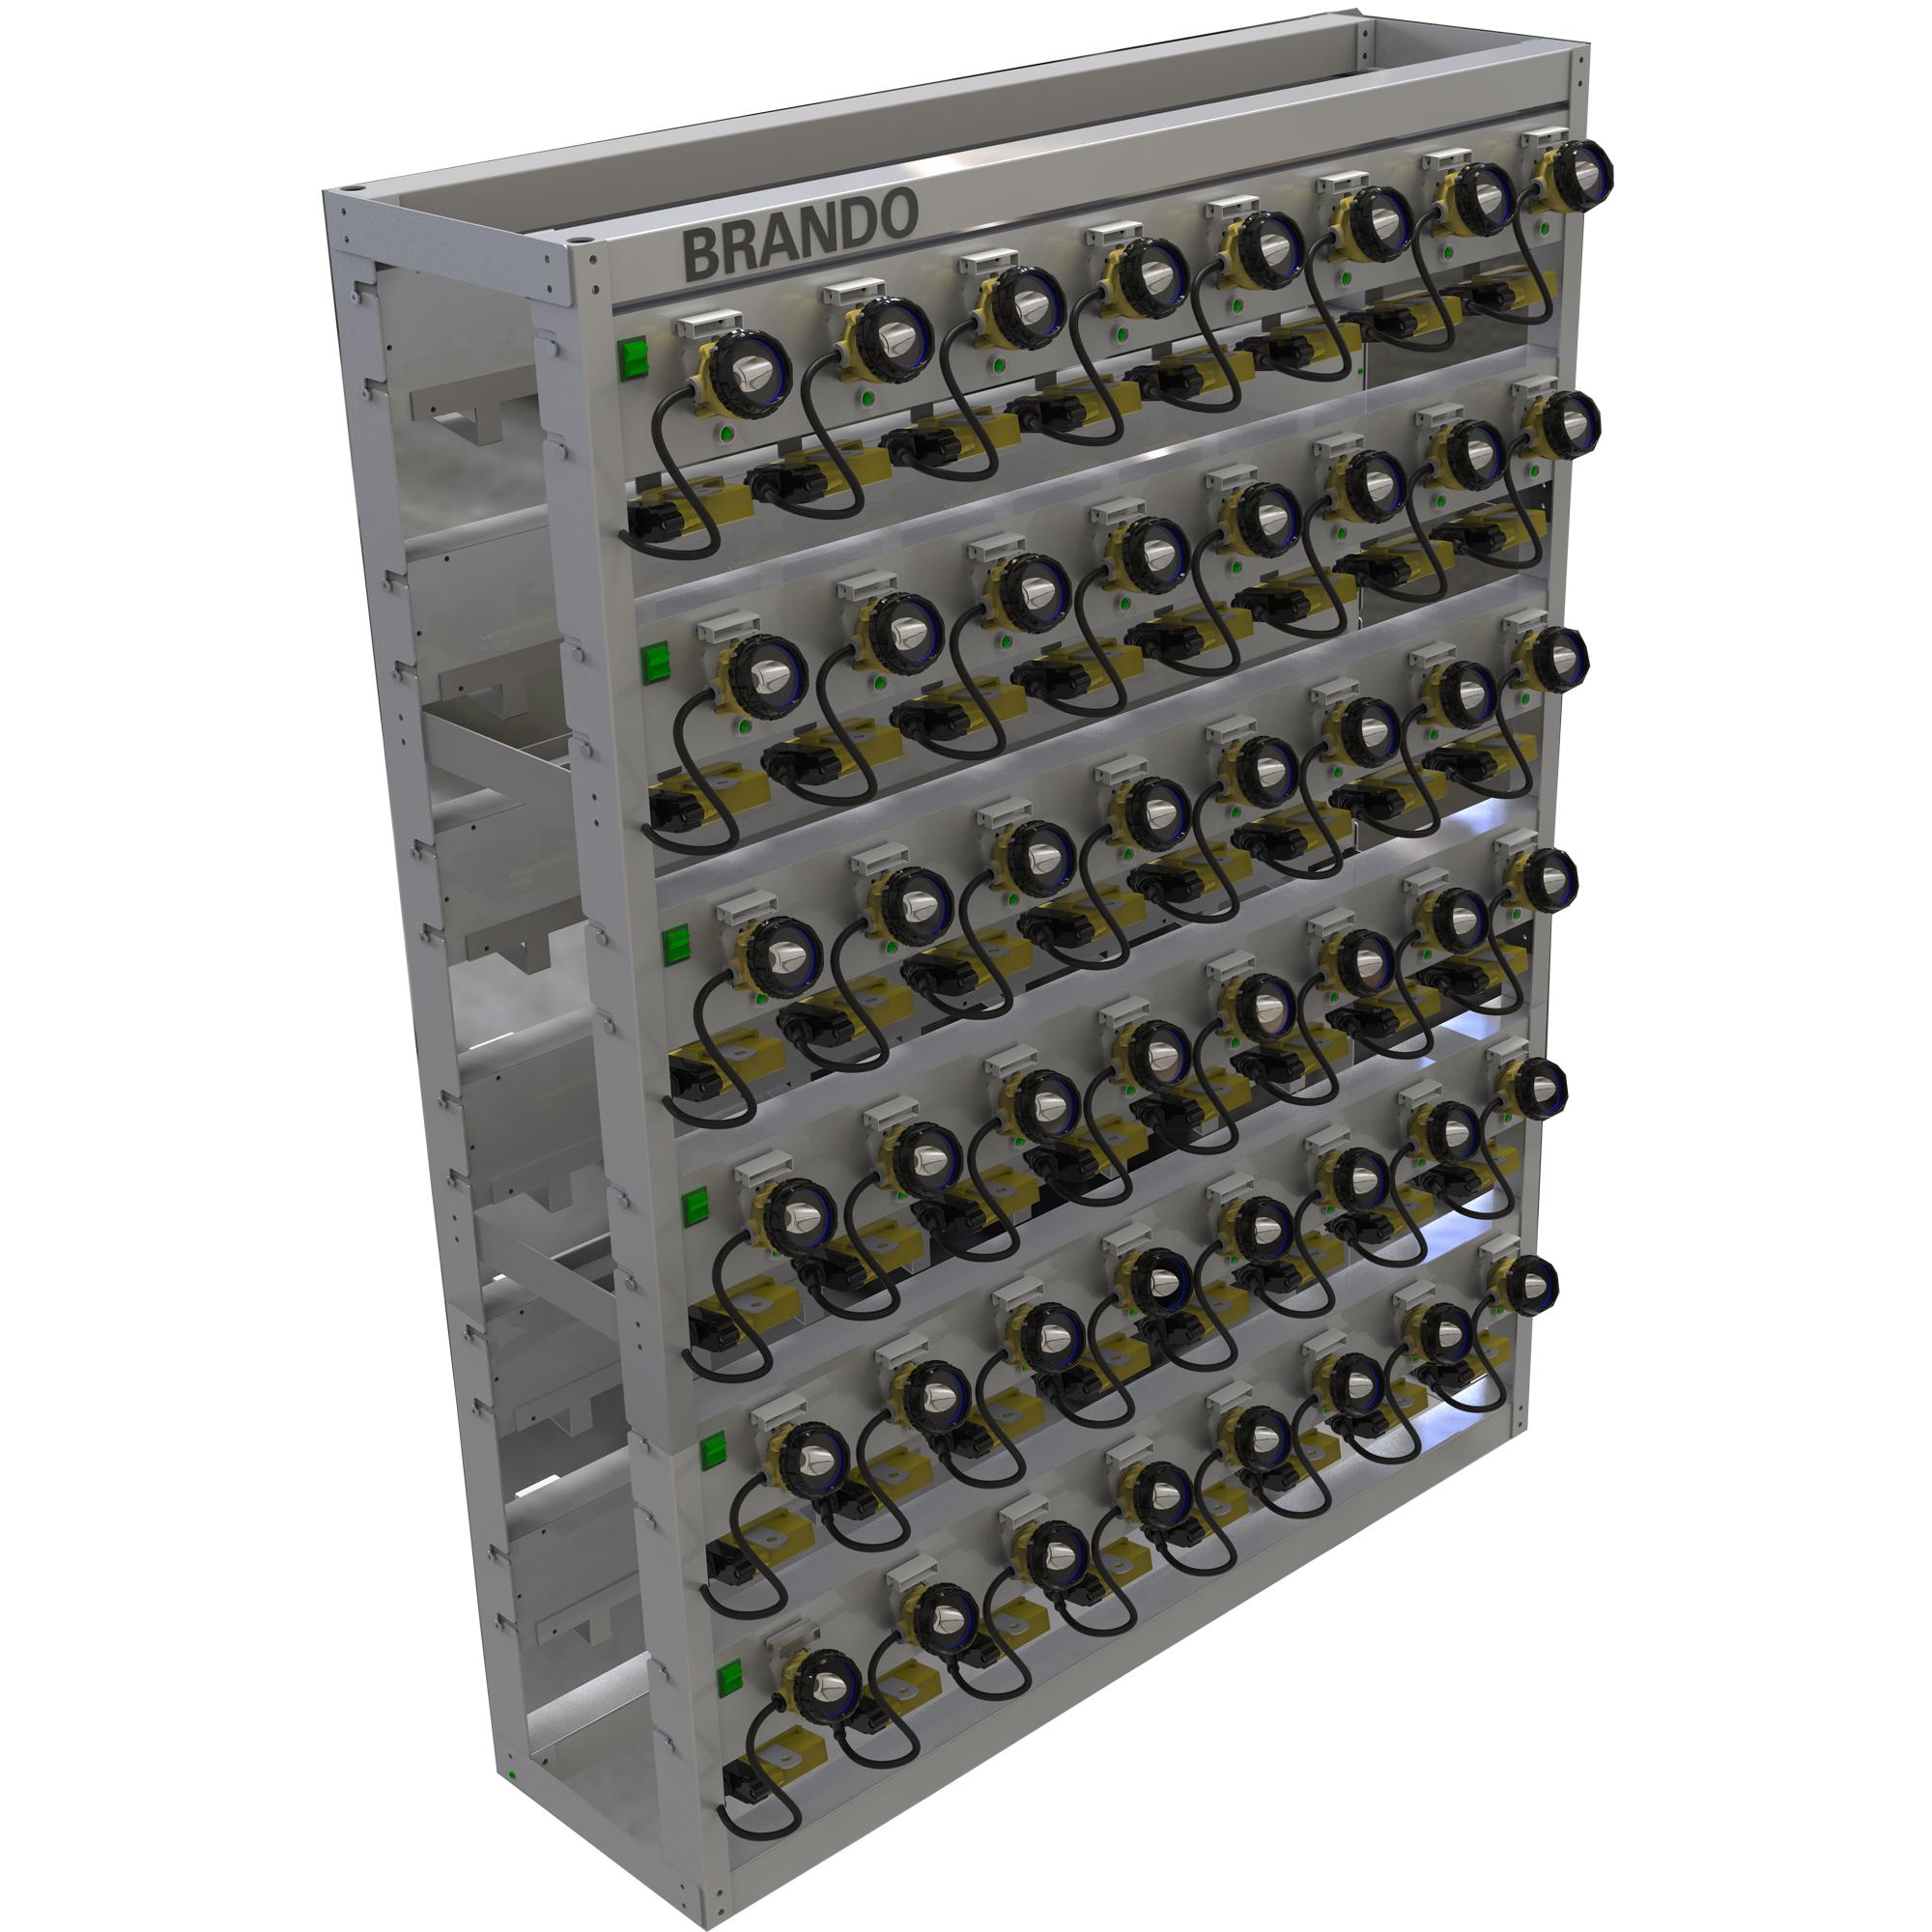 BRANDO 96units LED Cap Lamp Charger Racks with detachable modular